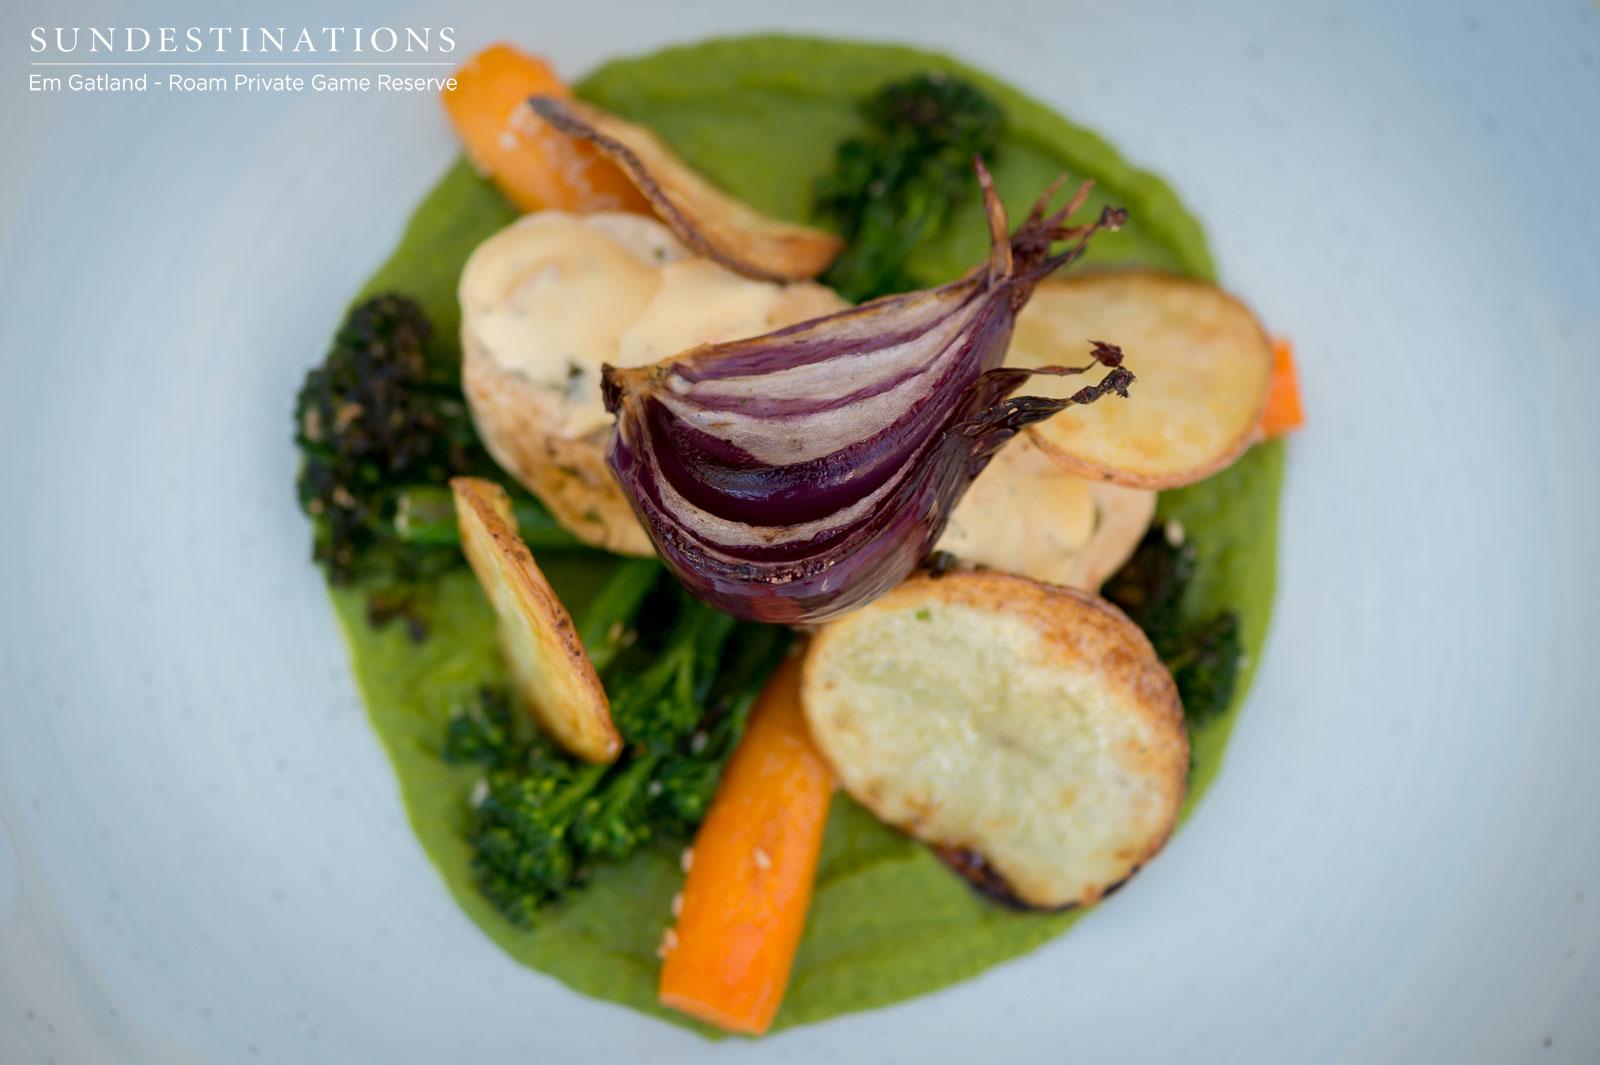 Vegetable and Roast at Roam